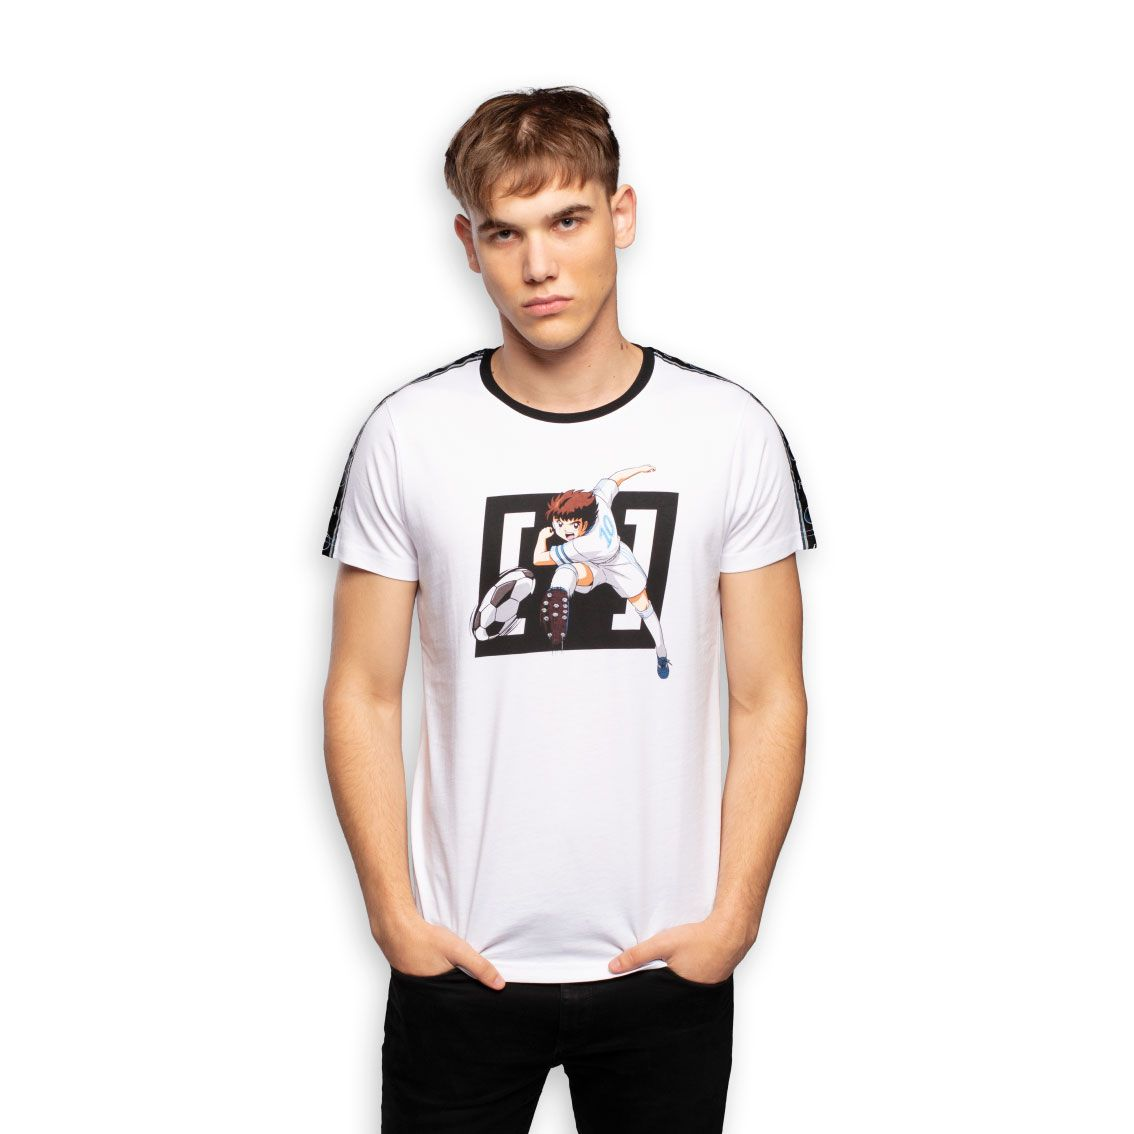 T-shirt homme captain tsubasa blanc (photo)